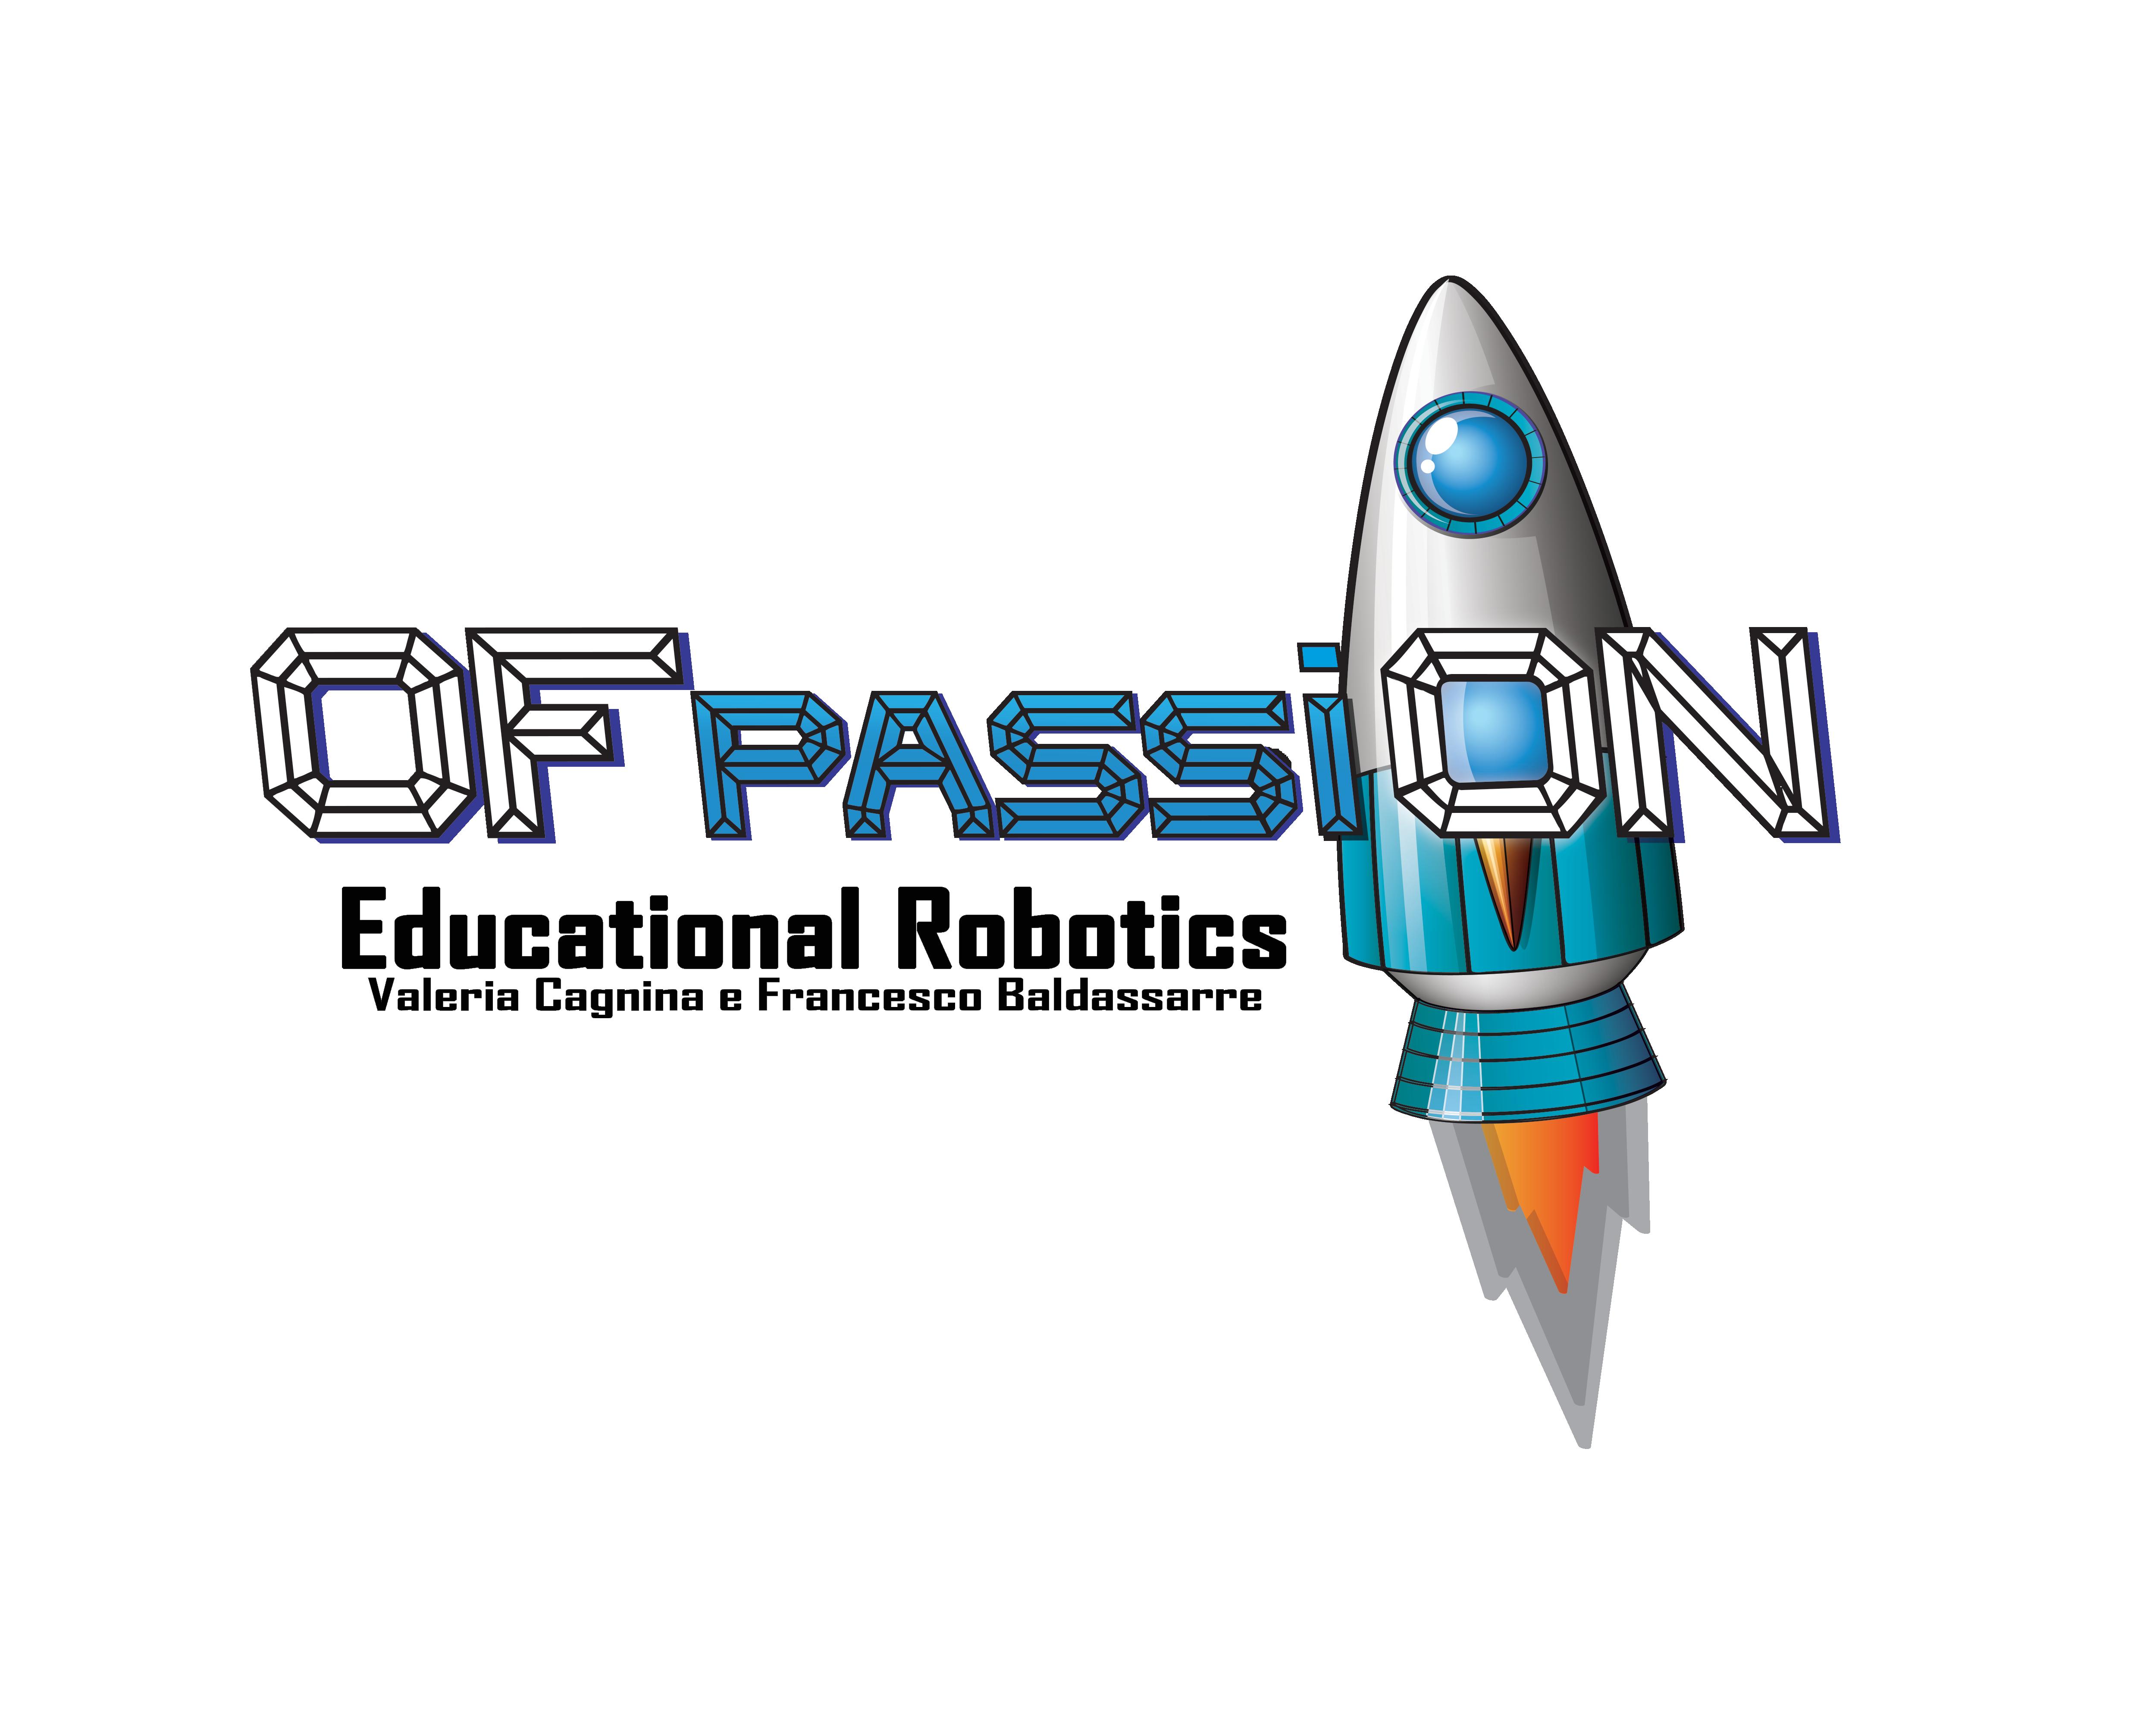 OFpassiON